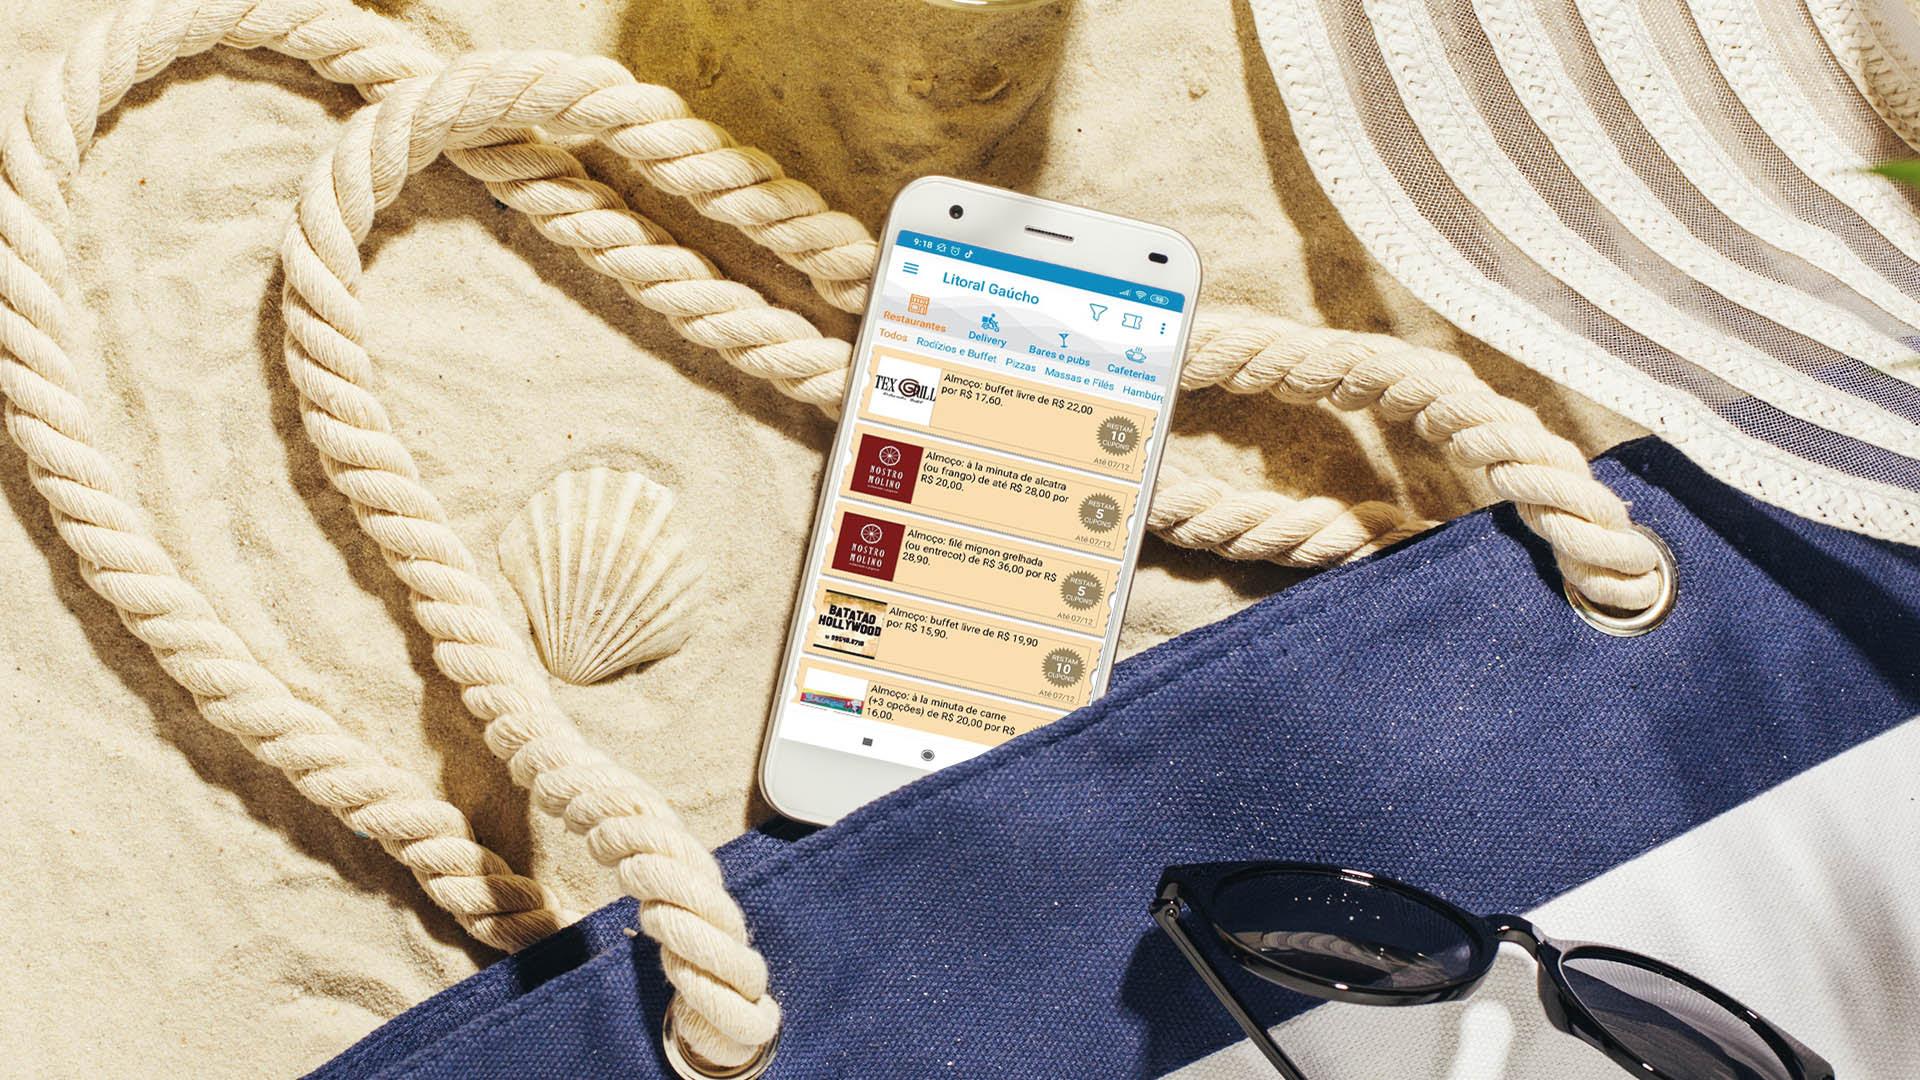 Dragon Venture Capital aposta em novos voos dos apps Mobo e Dowing